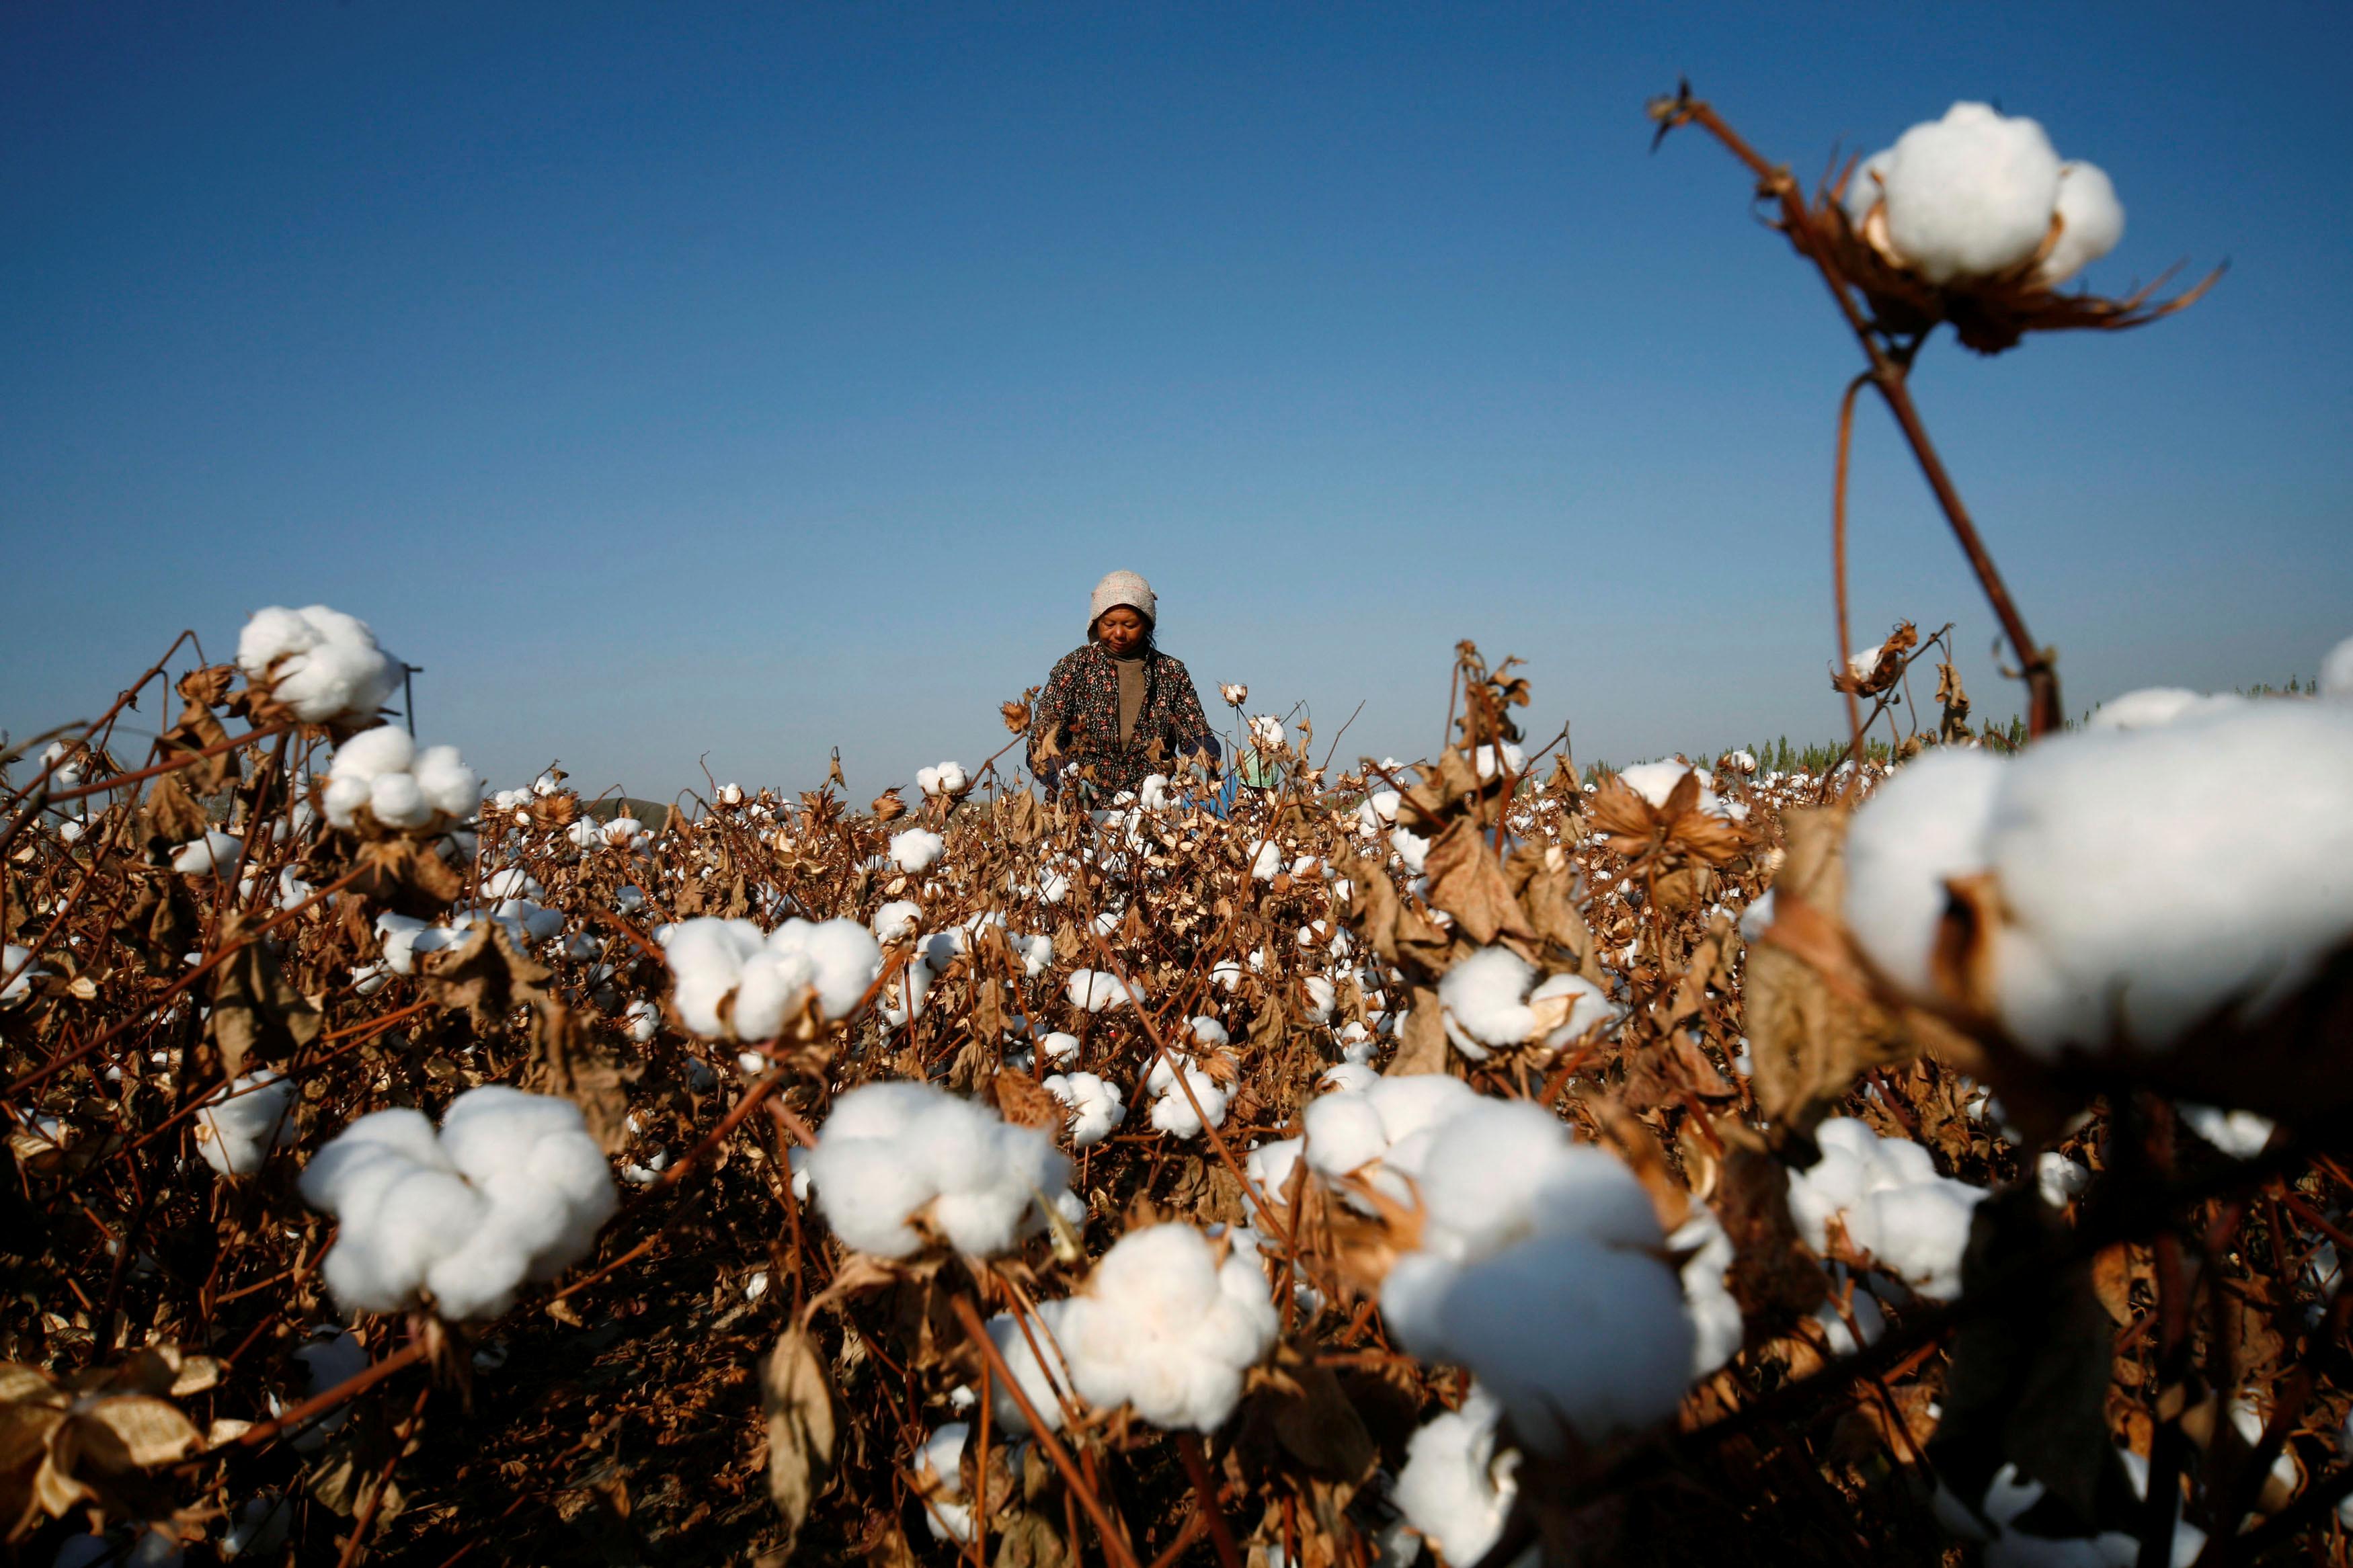 A farmer picks cotton on a farm on the outskirts of Hami, Xinjiang Uighur Autonomous Region November 3, 2010. REUTERS/Stringer